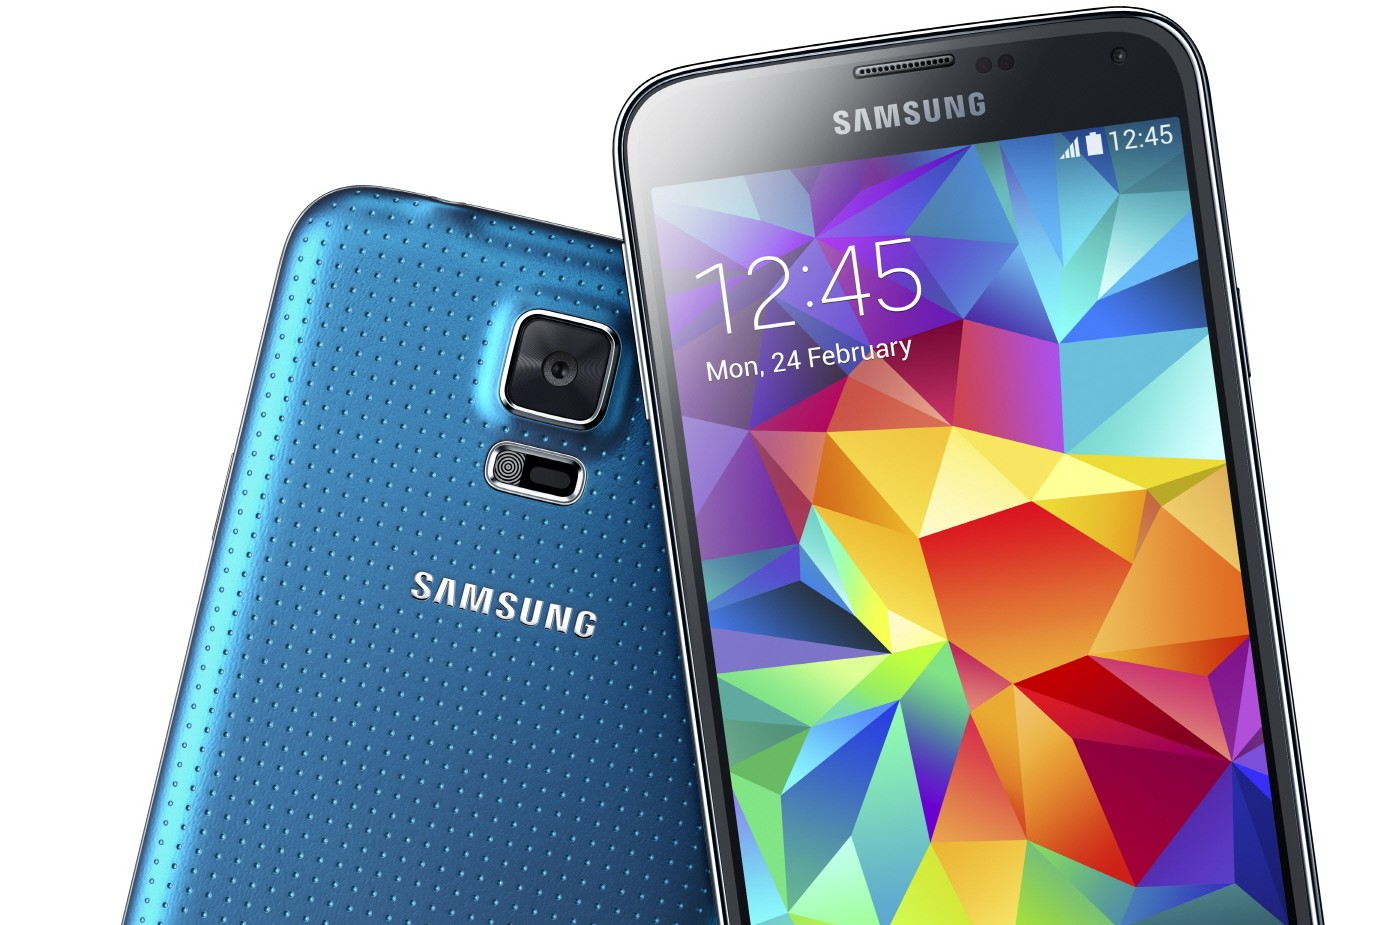 Samsung Galaxy S5 in blue